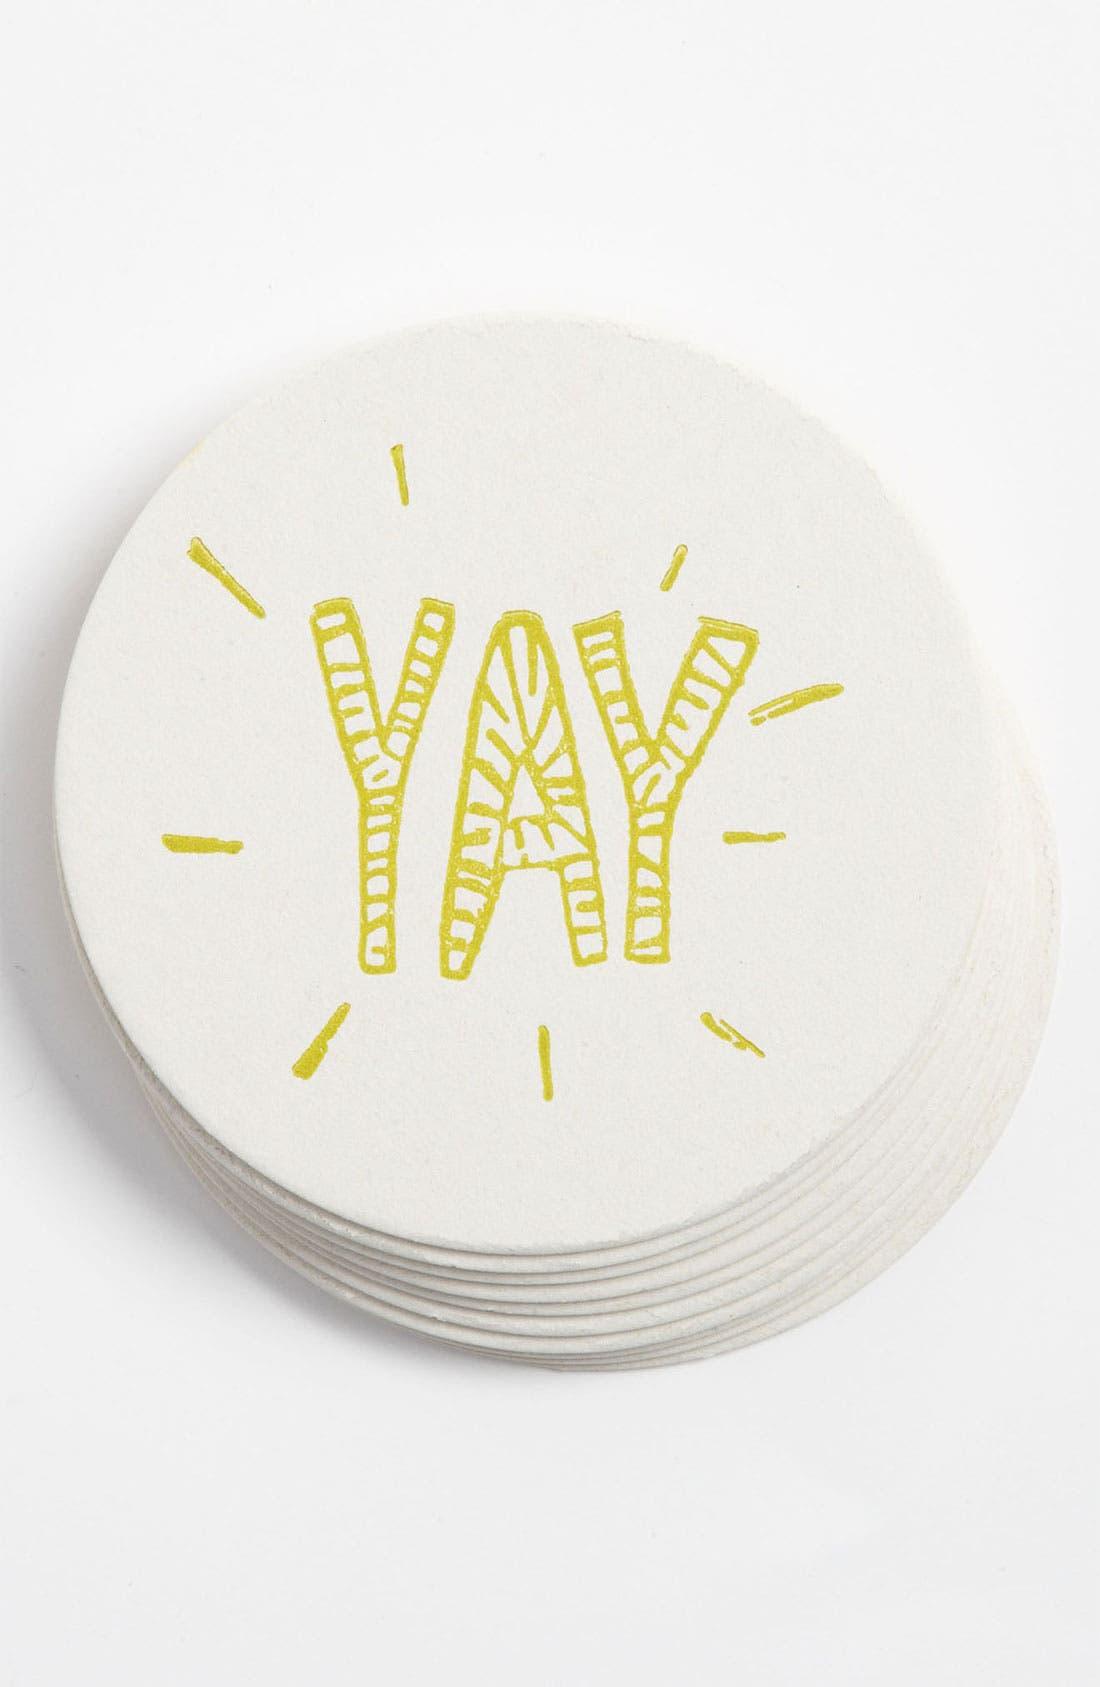 Alternate Image 1 Selected - 'Yay' Letterpress Coasters (Set of 10)